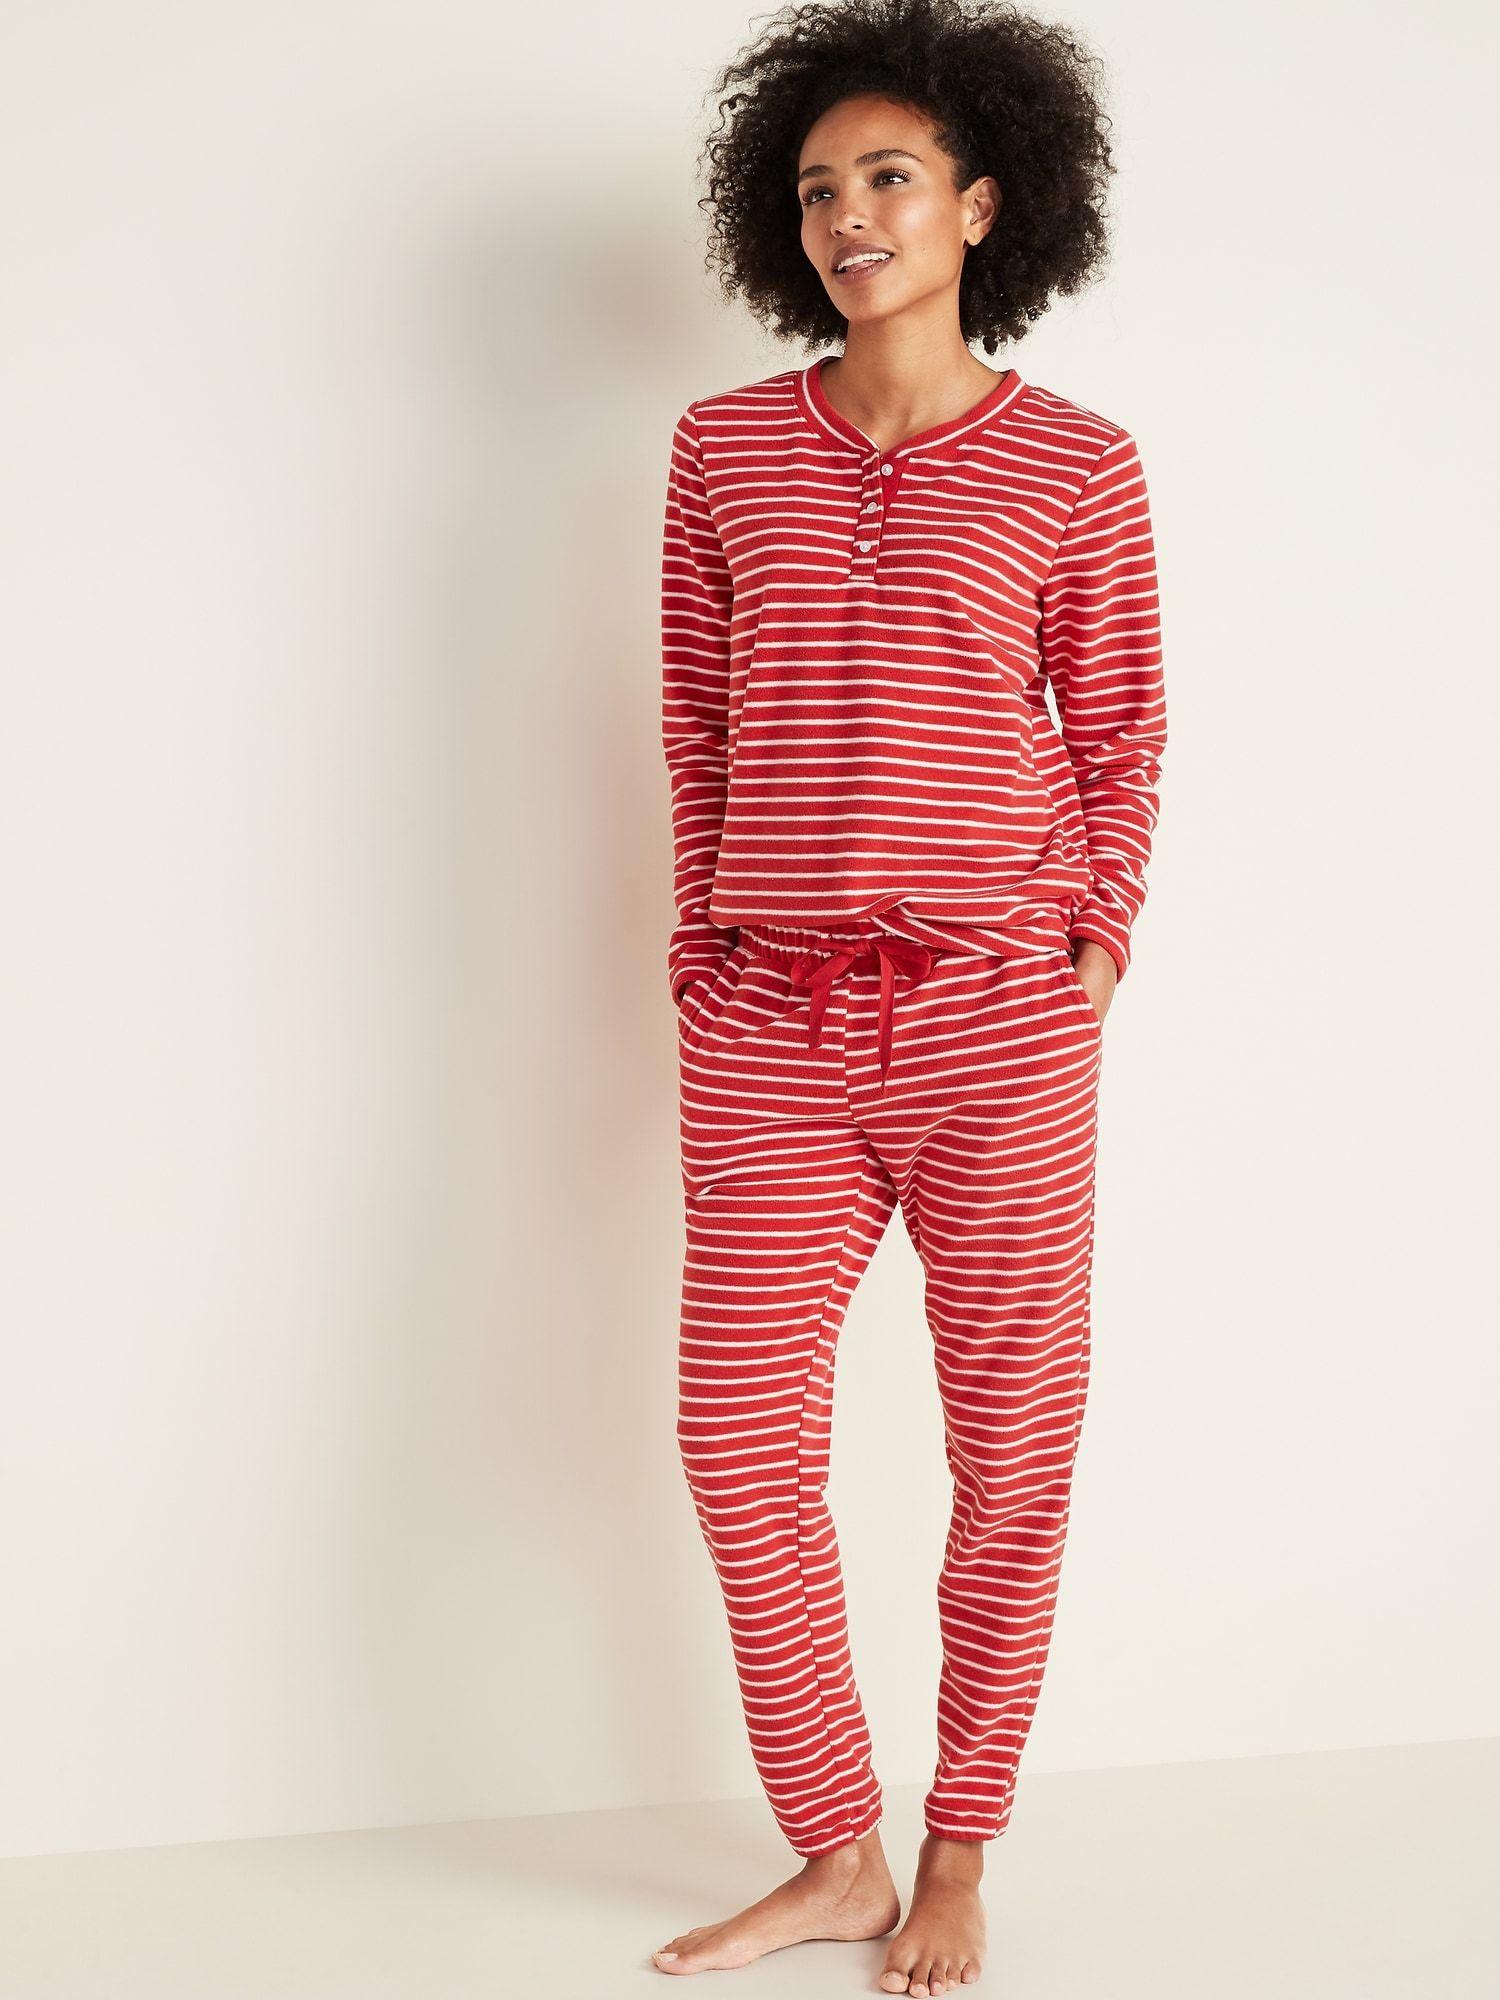 Micro Performance Fleece Pajama Set for Women Old Navy